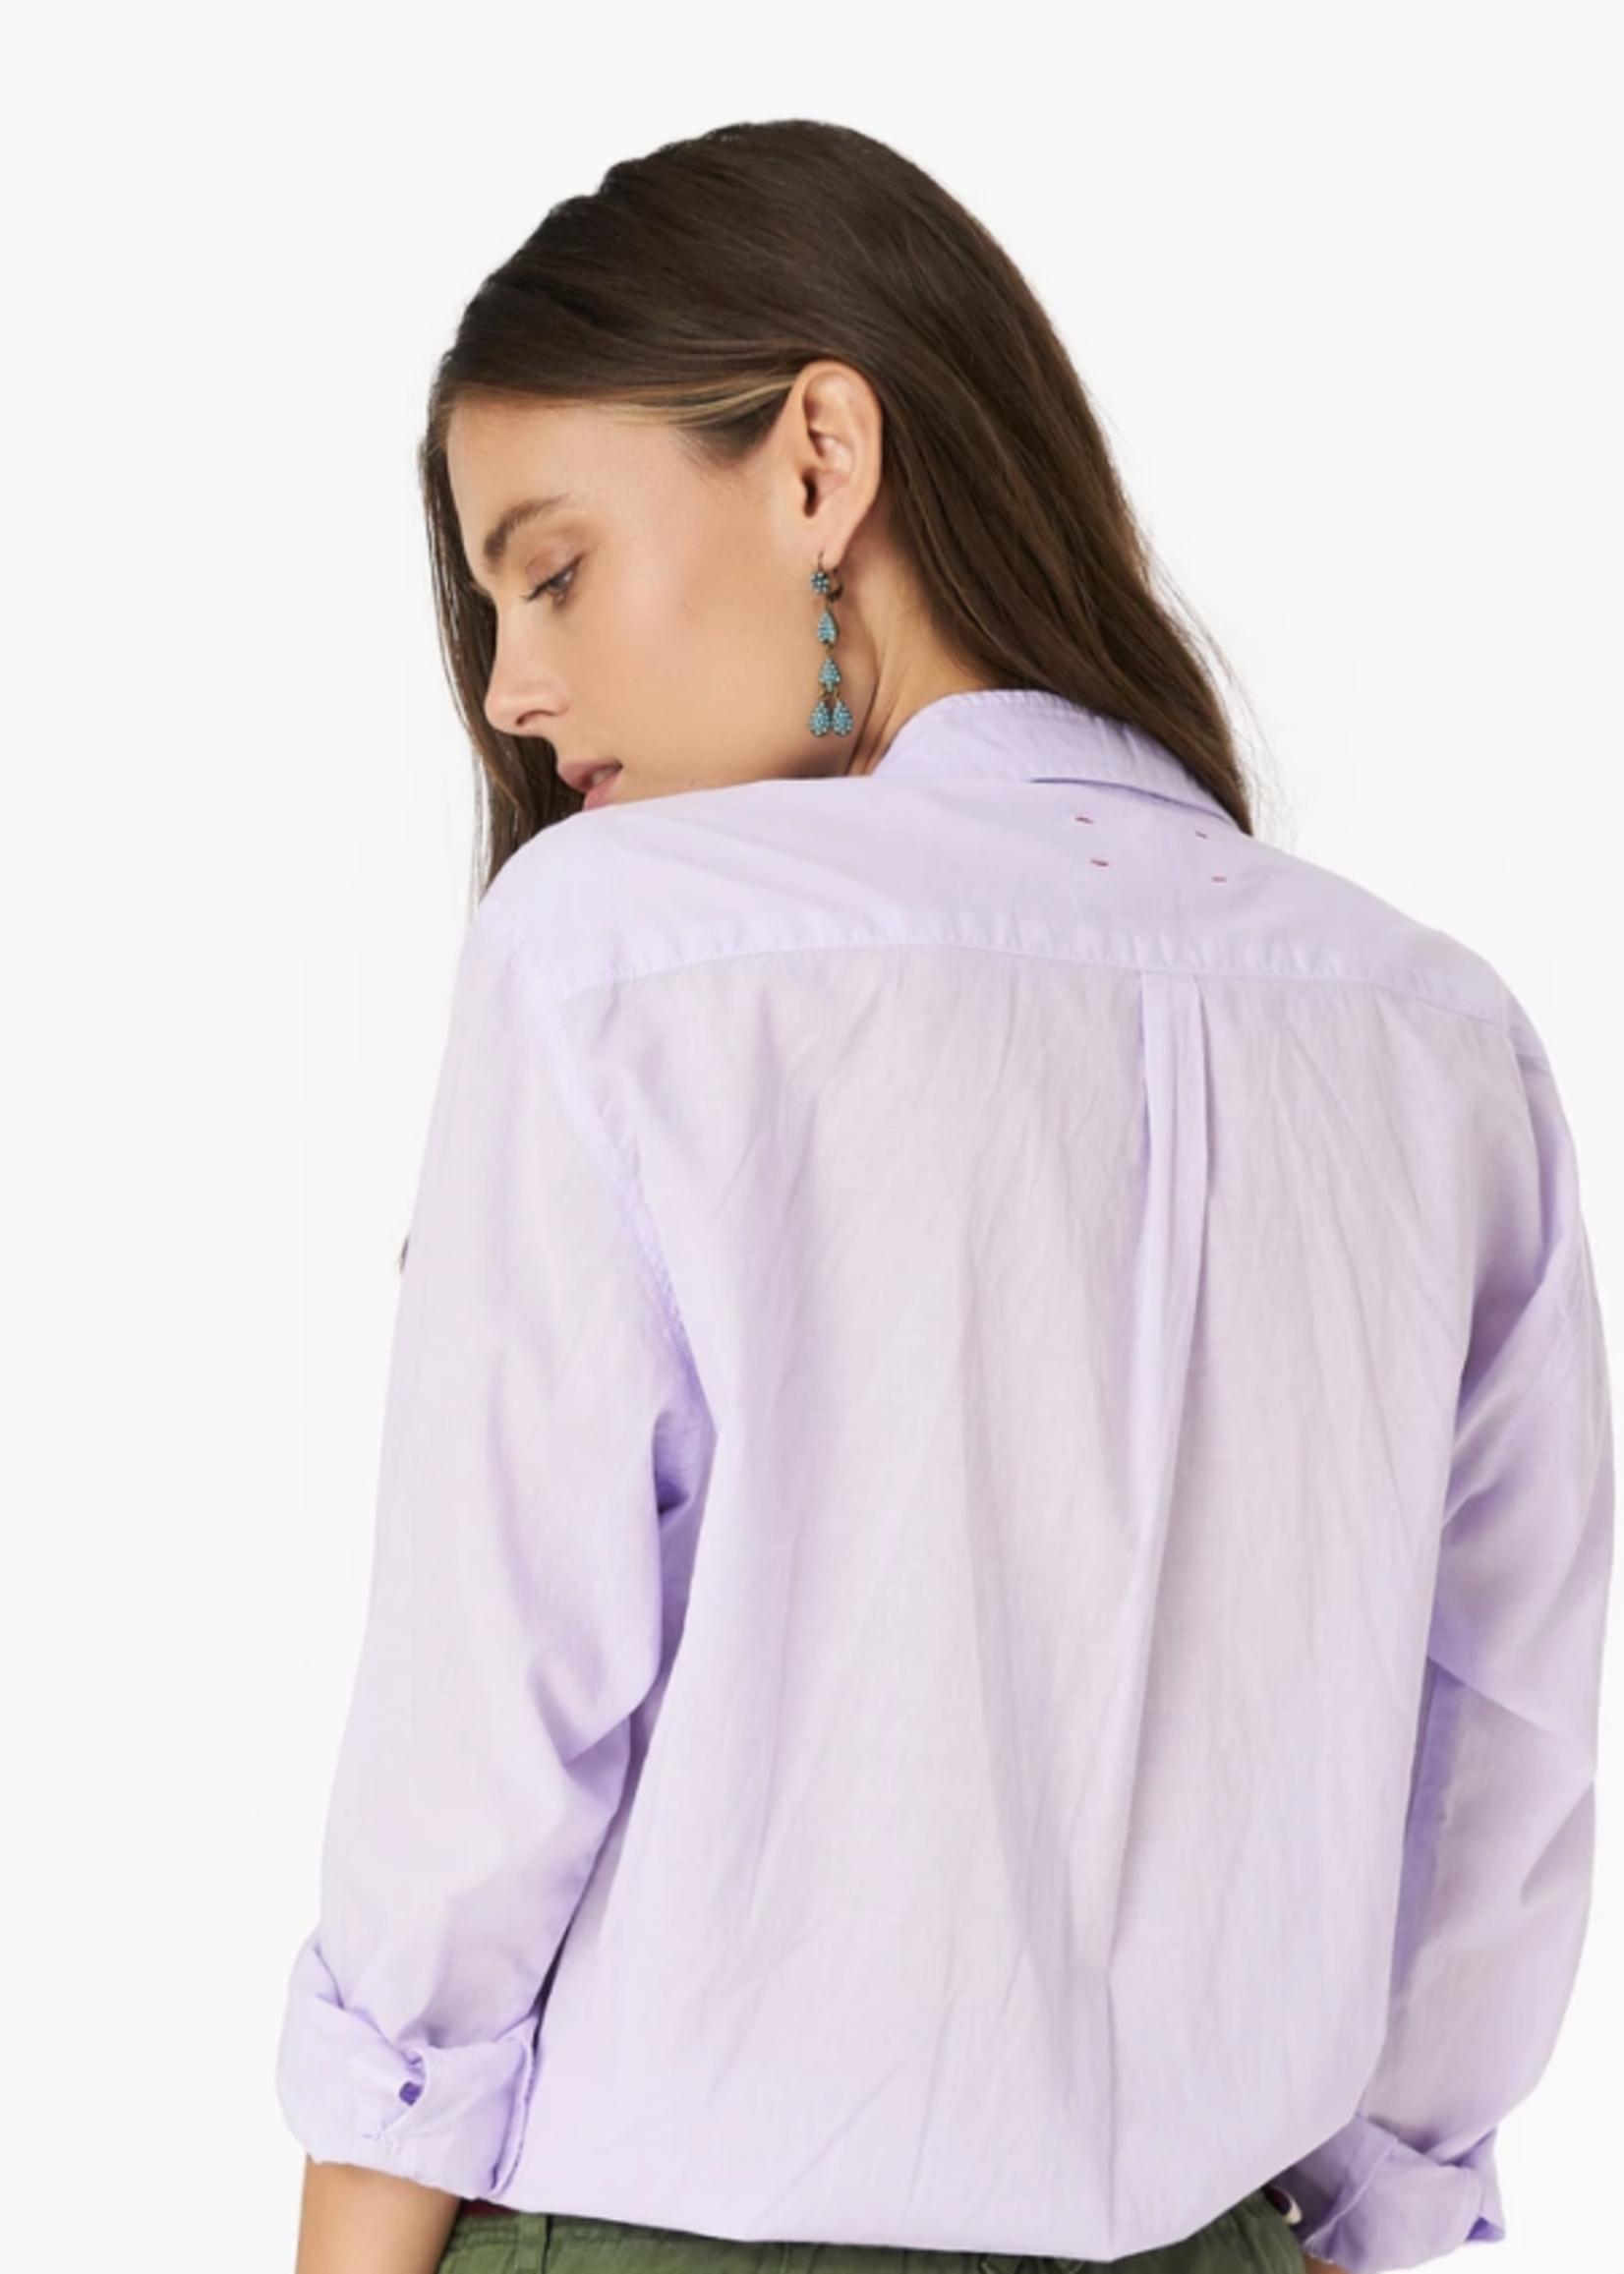 xirena xirena beau shirt lavender bloom